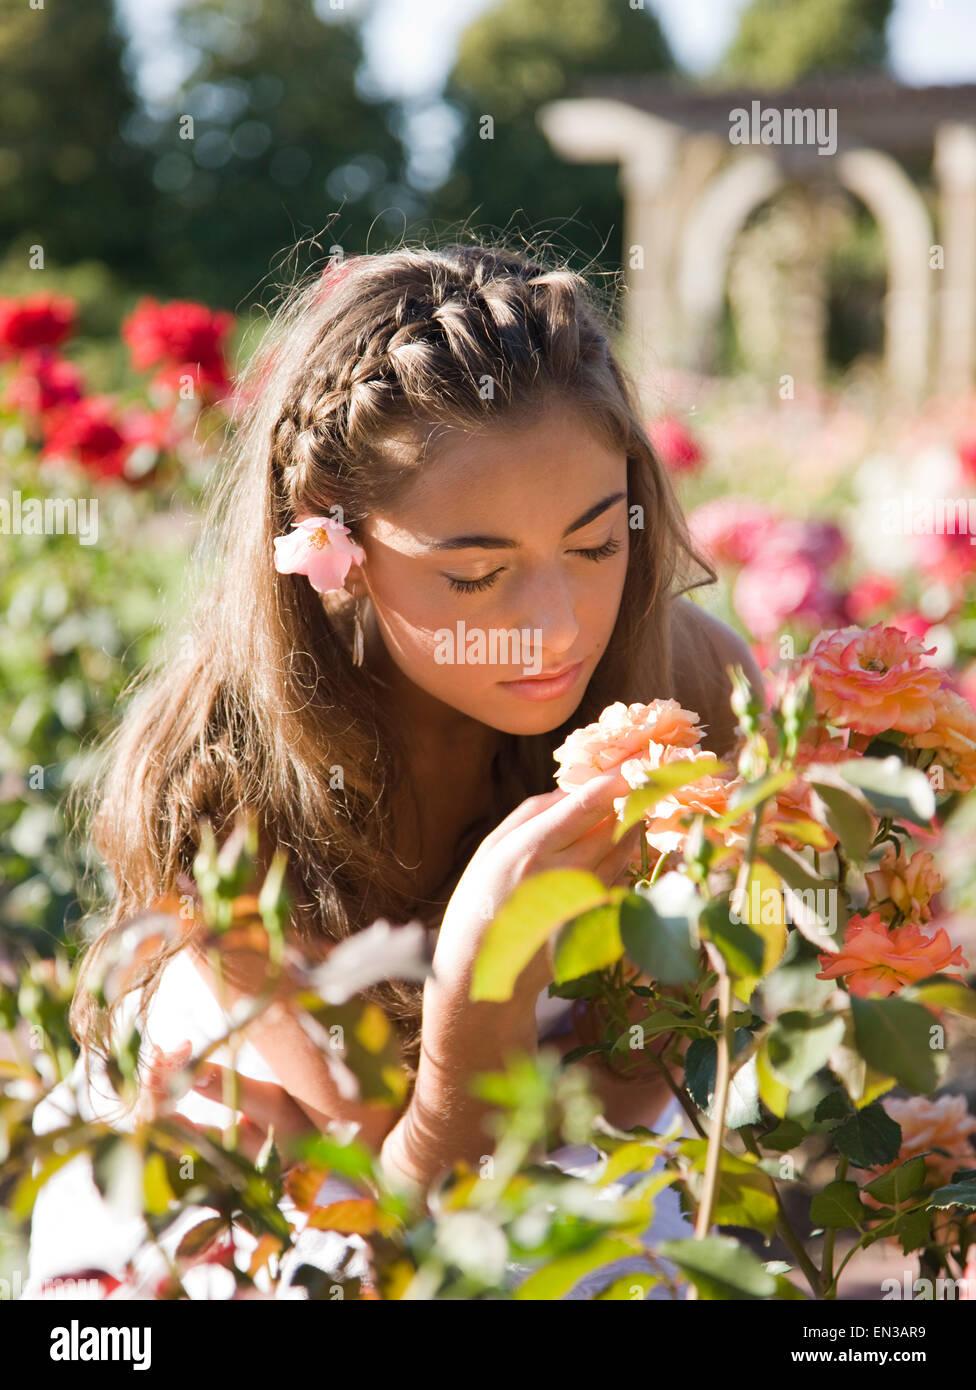 American teen girl smelling